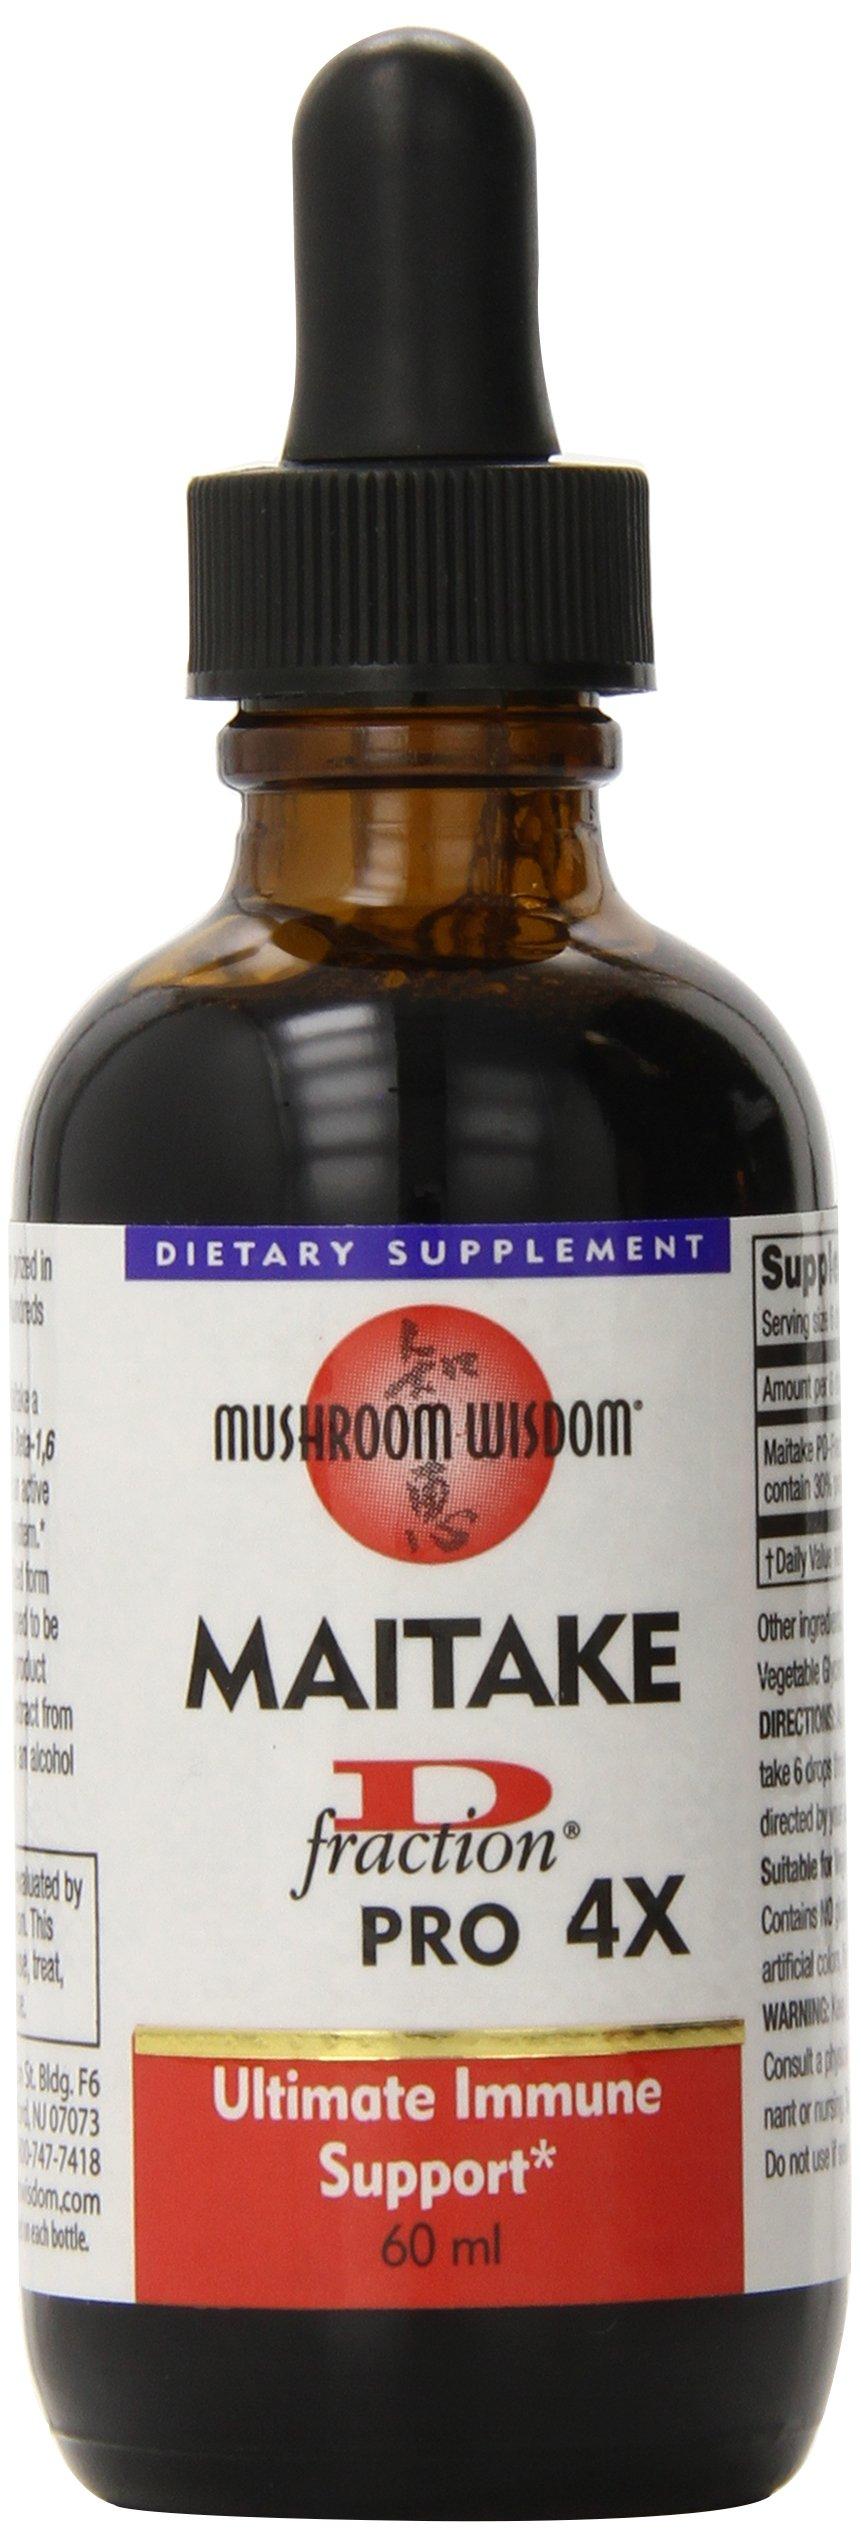 Mushroom Wisdom, Inc. Maitake D Fraction Pro 4X 60 ml.